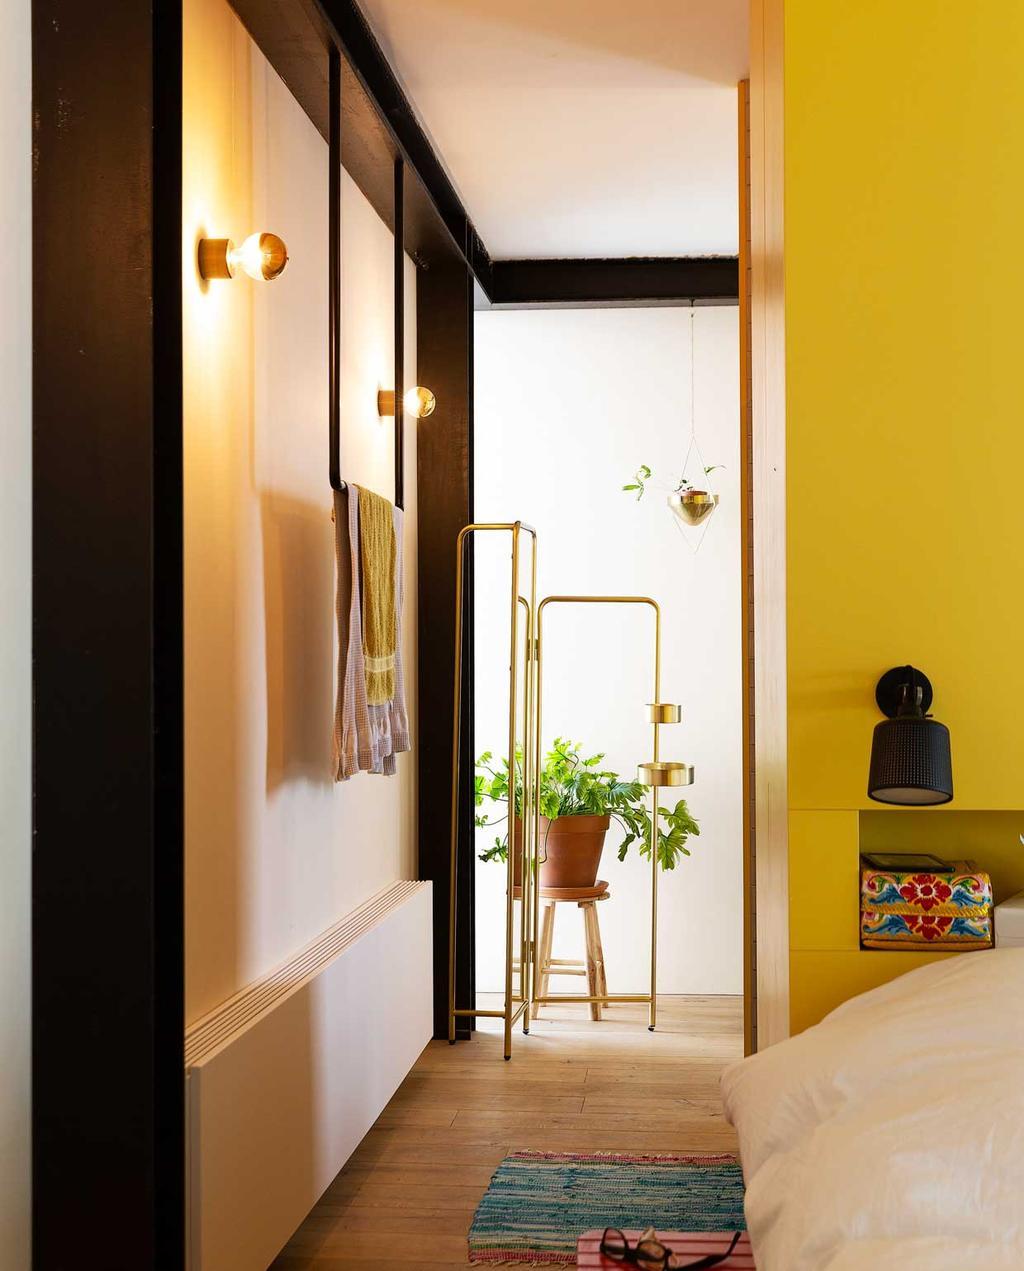 vtwonen 2020-03 | Binnenkijken | gele slaapkamer